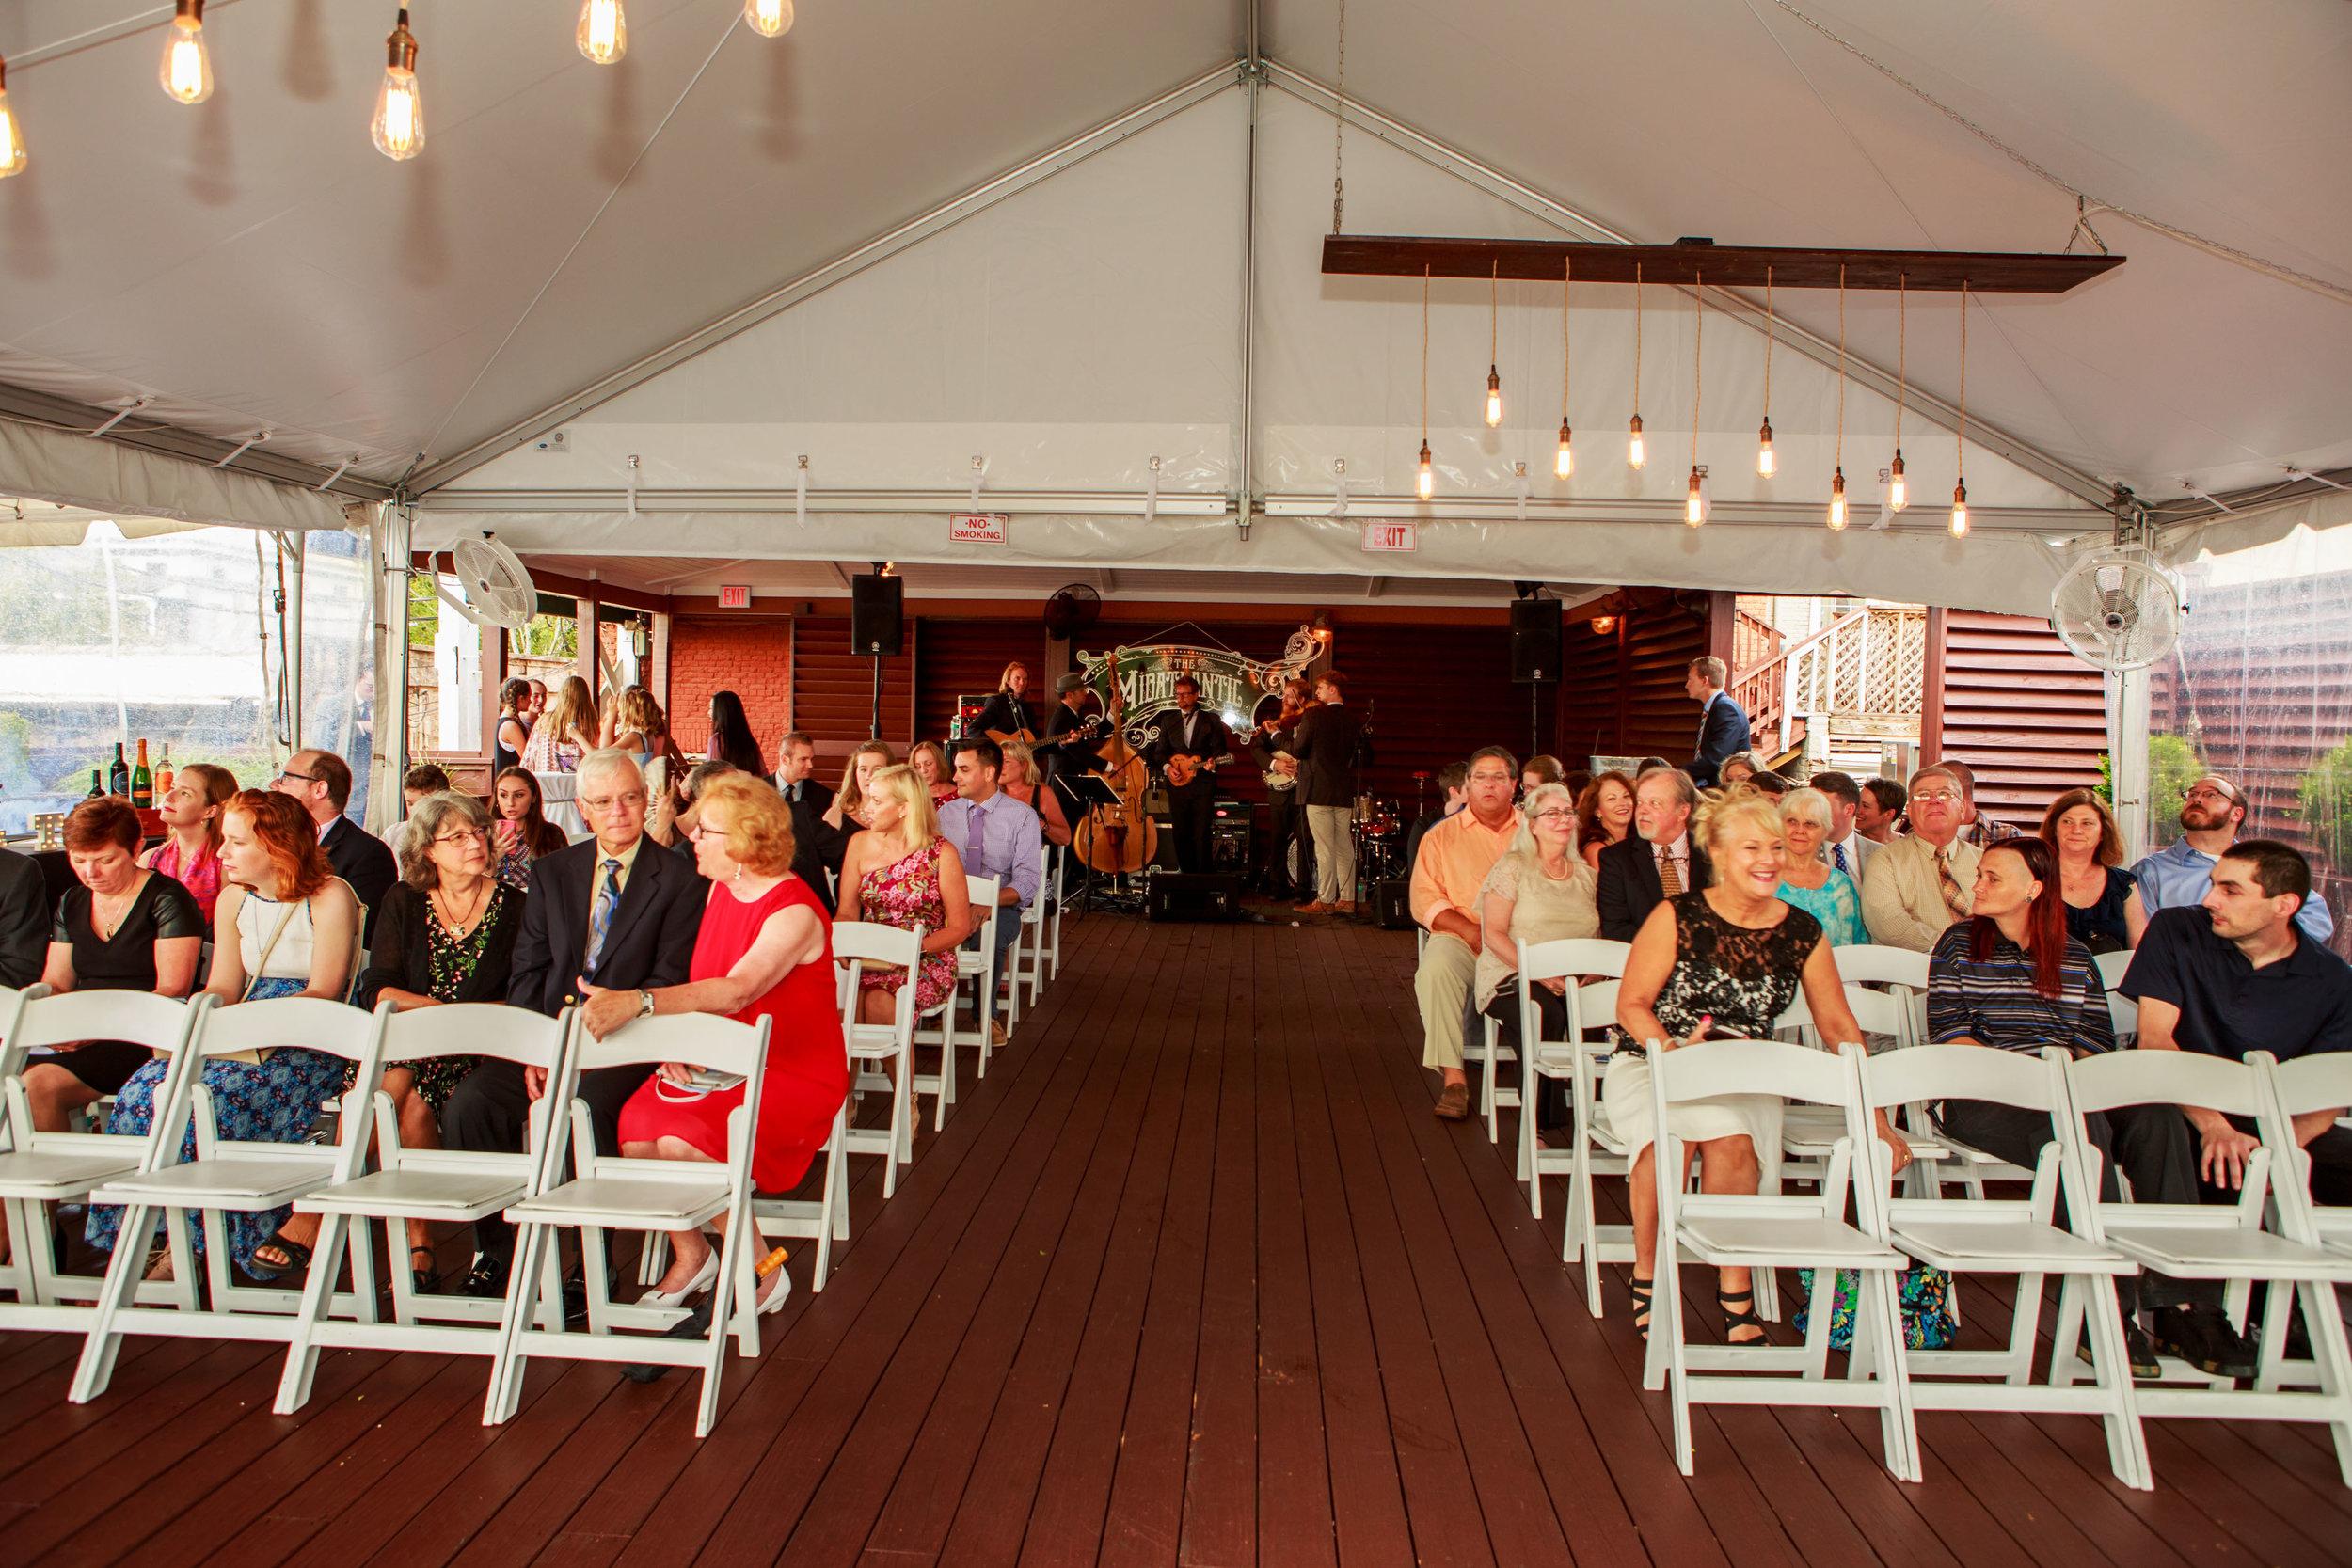 128-South-Wedding-Wilmington-NC-Photographer-Ceremony-01.0.jpg